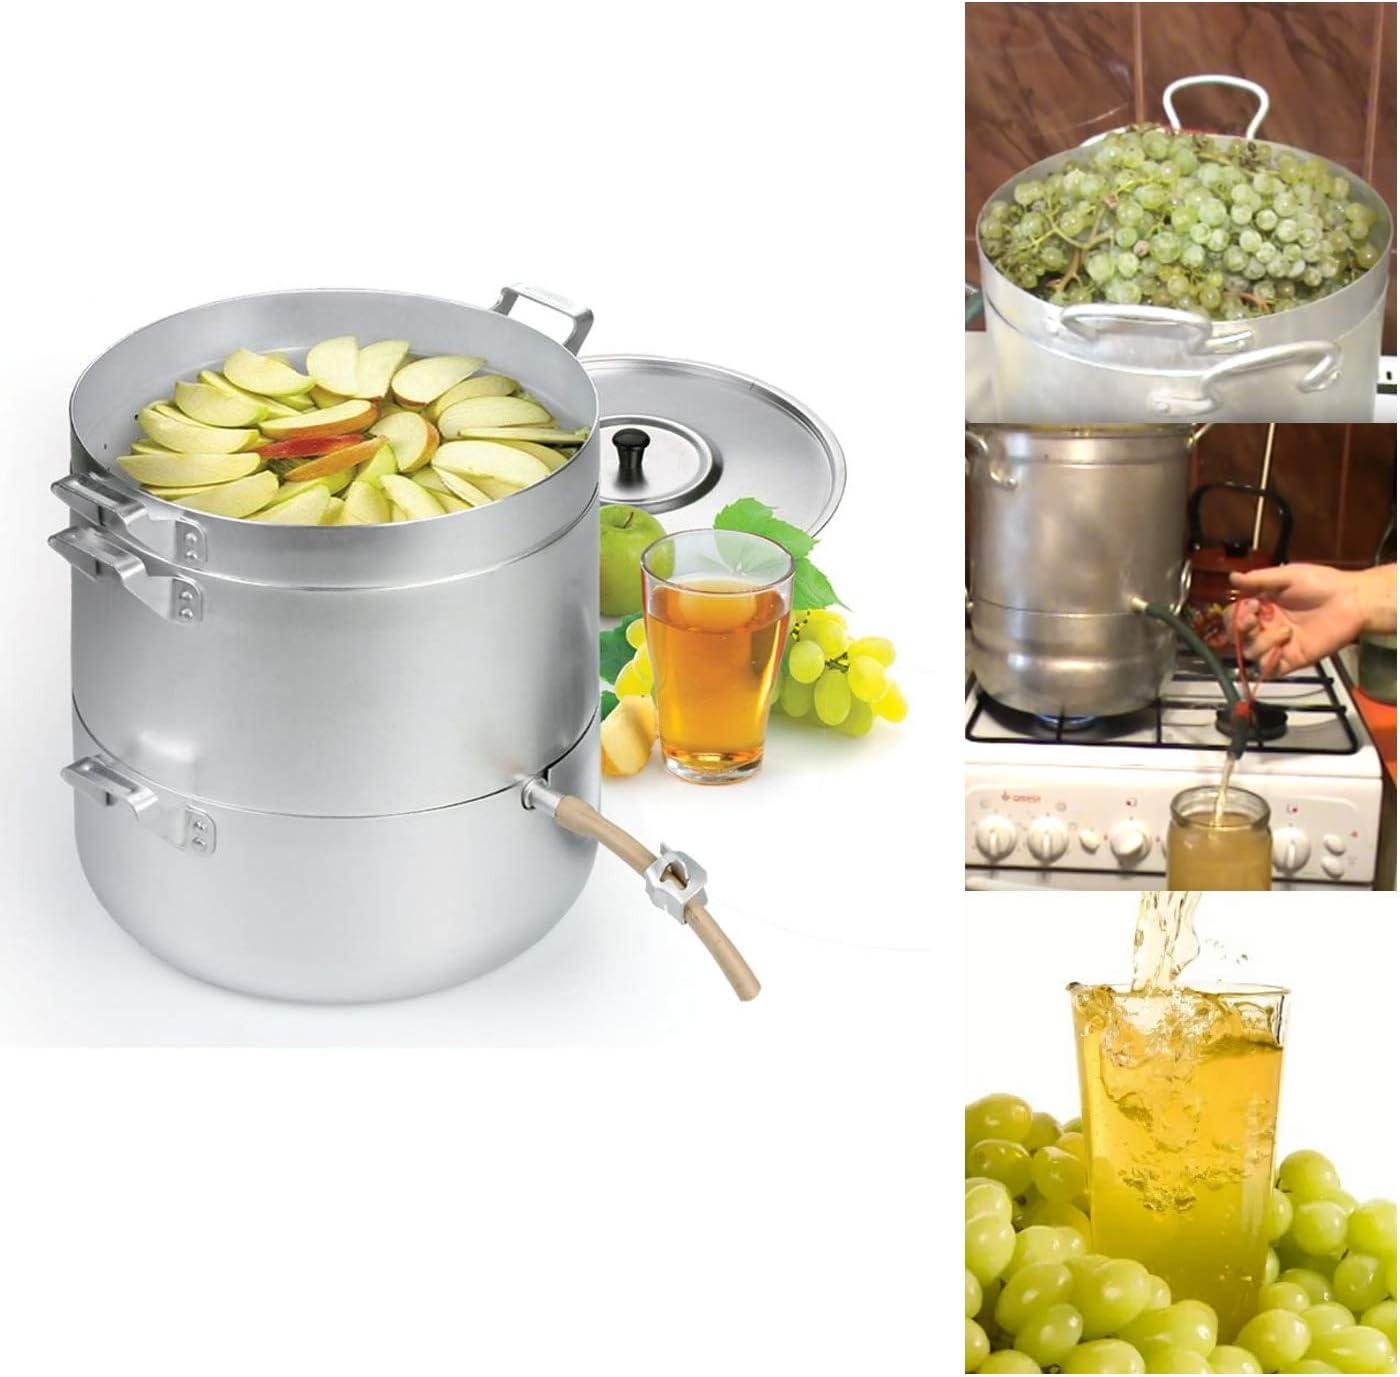 Steam Juicer Steamer Natural Juice Cooking Food Aluminum 1.58 Gal / 6 Liters